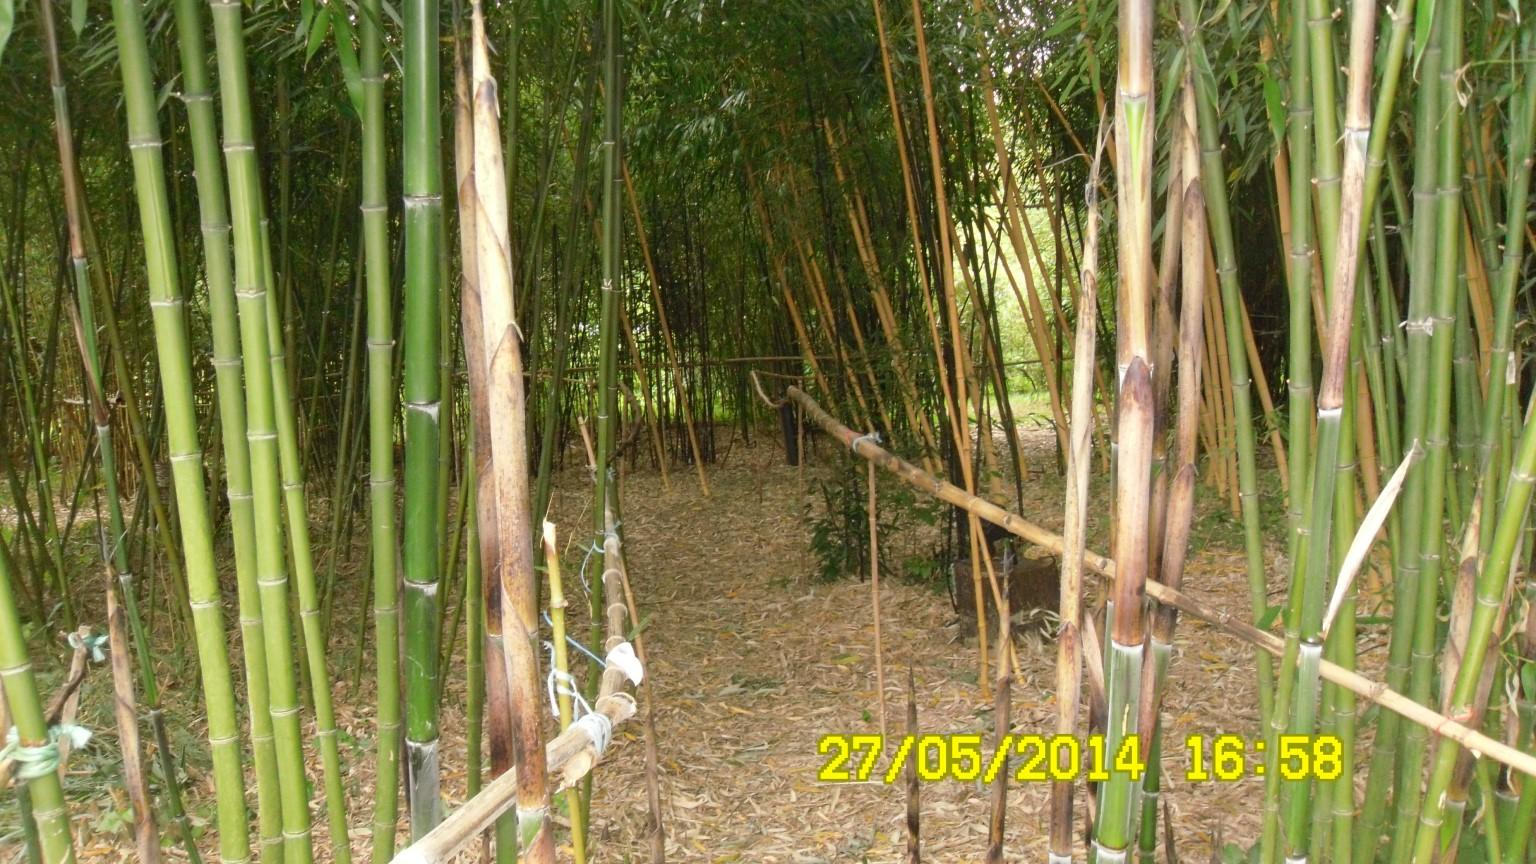 jardin de bambous NET 14 2 JPG